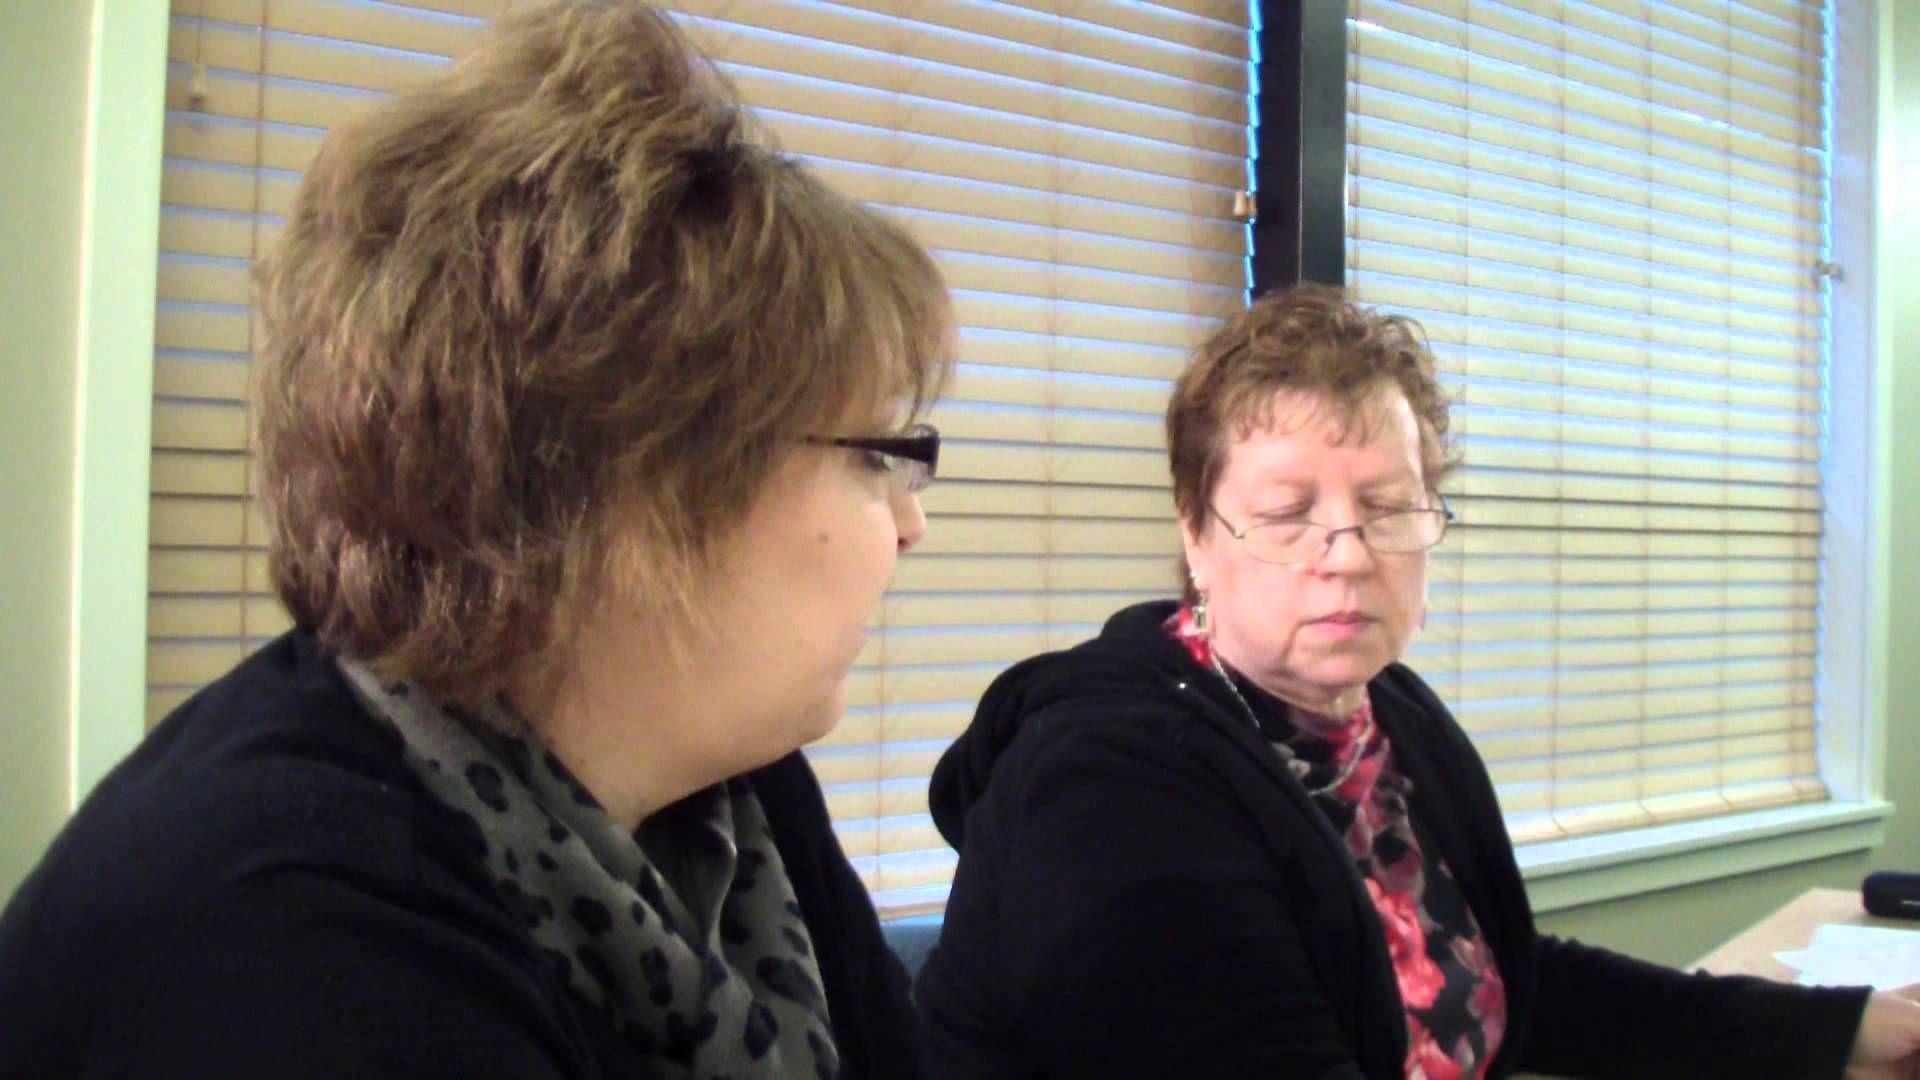 CCRR Community Services Community service, Child care